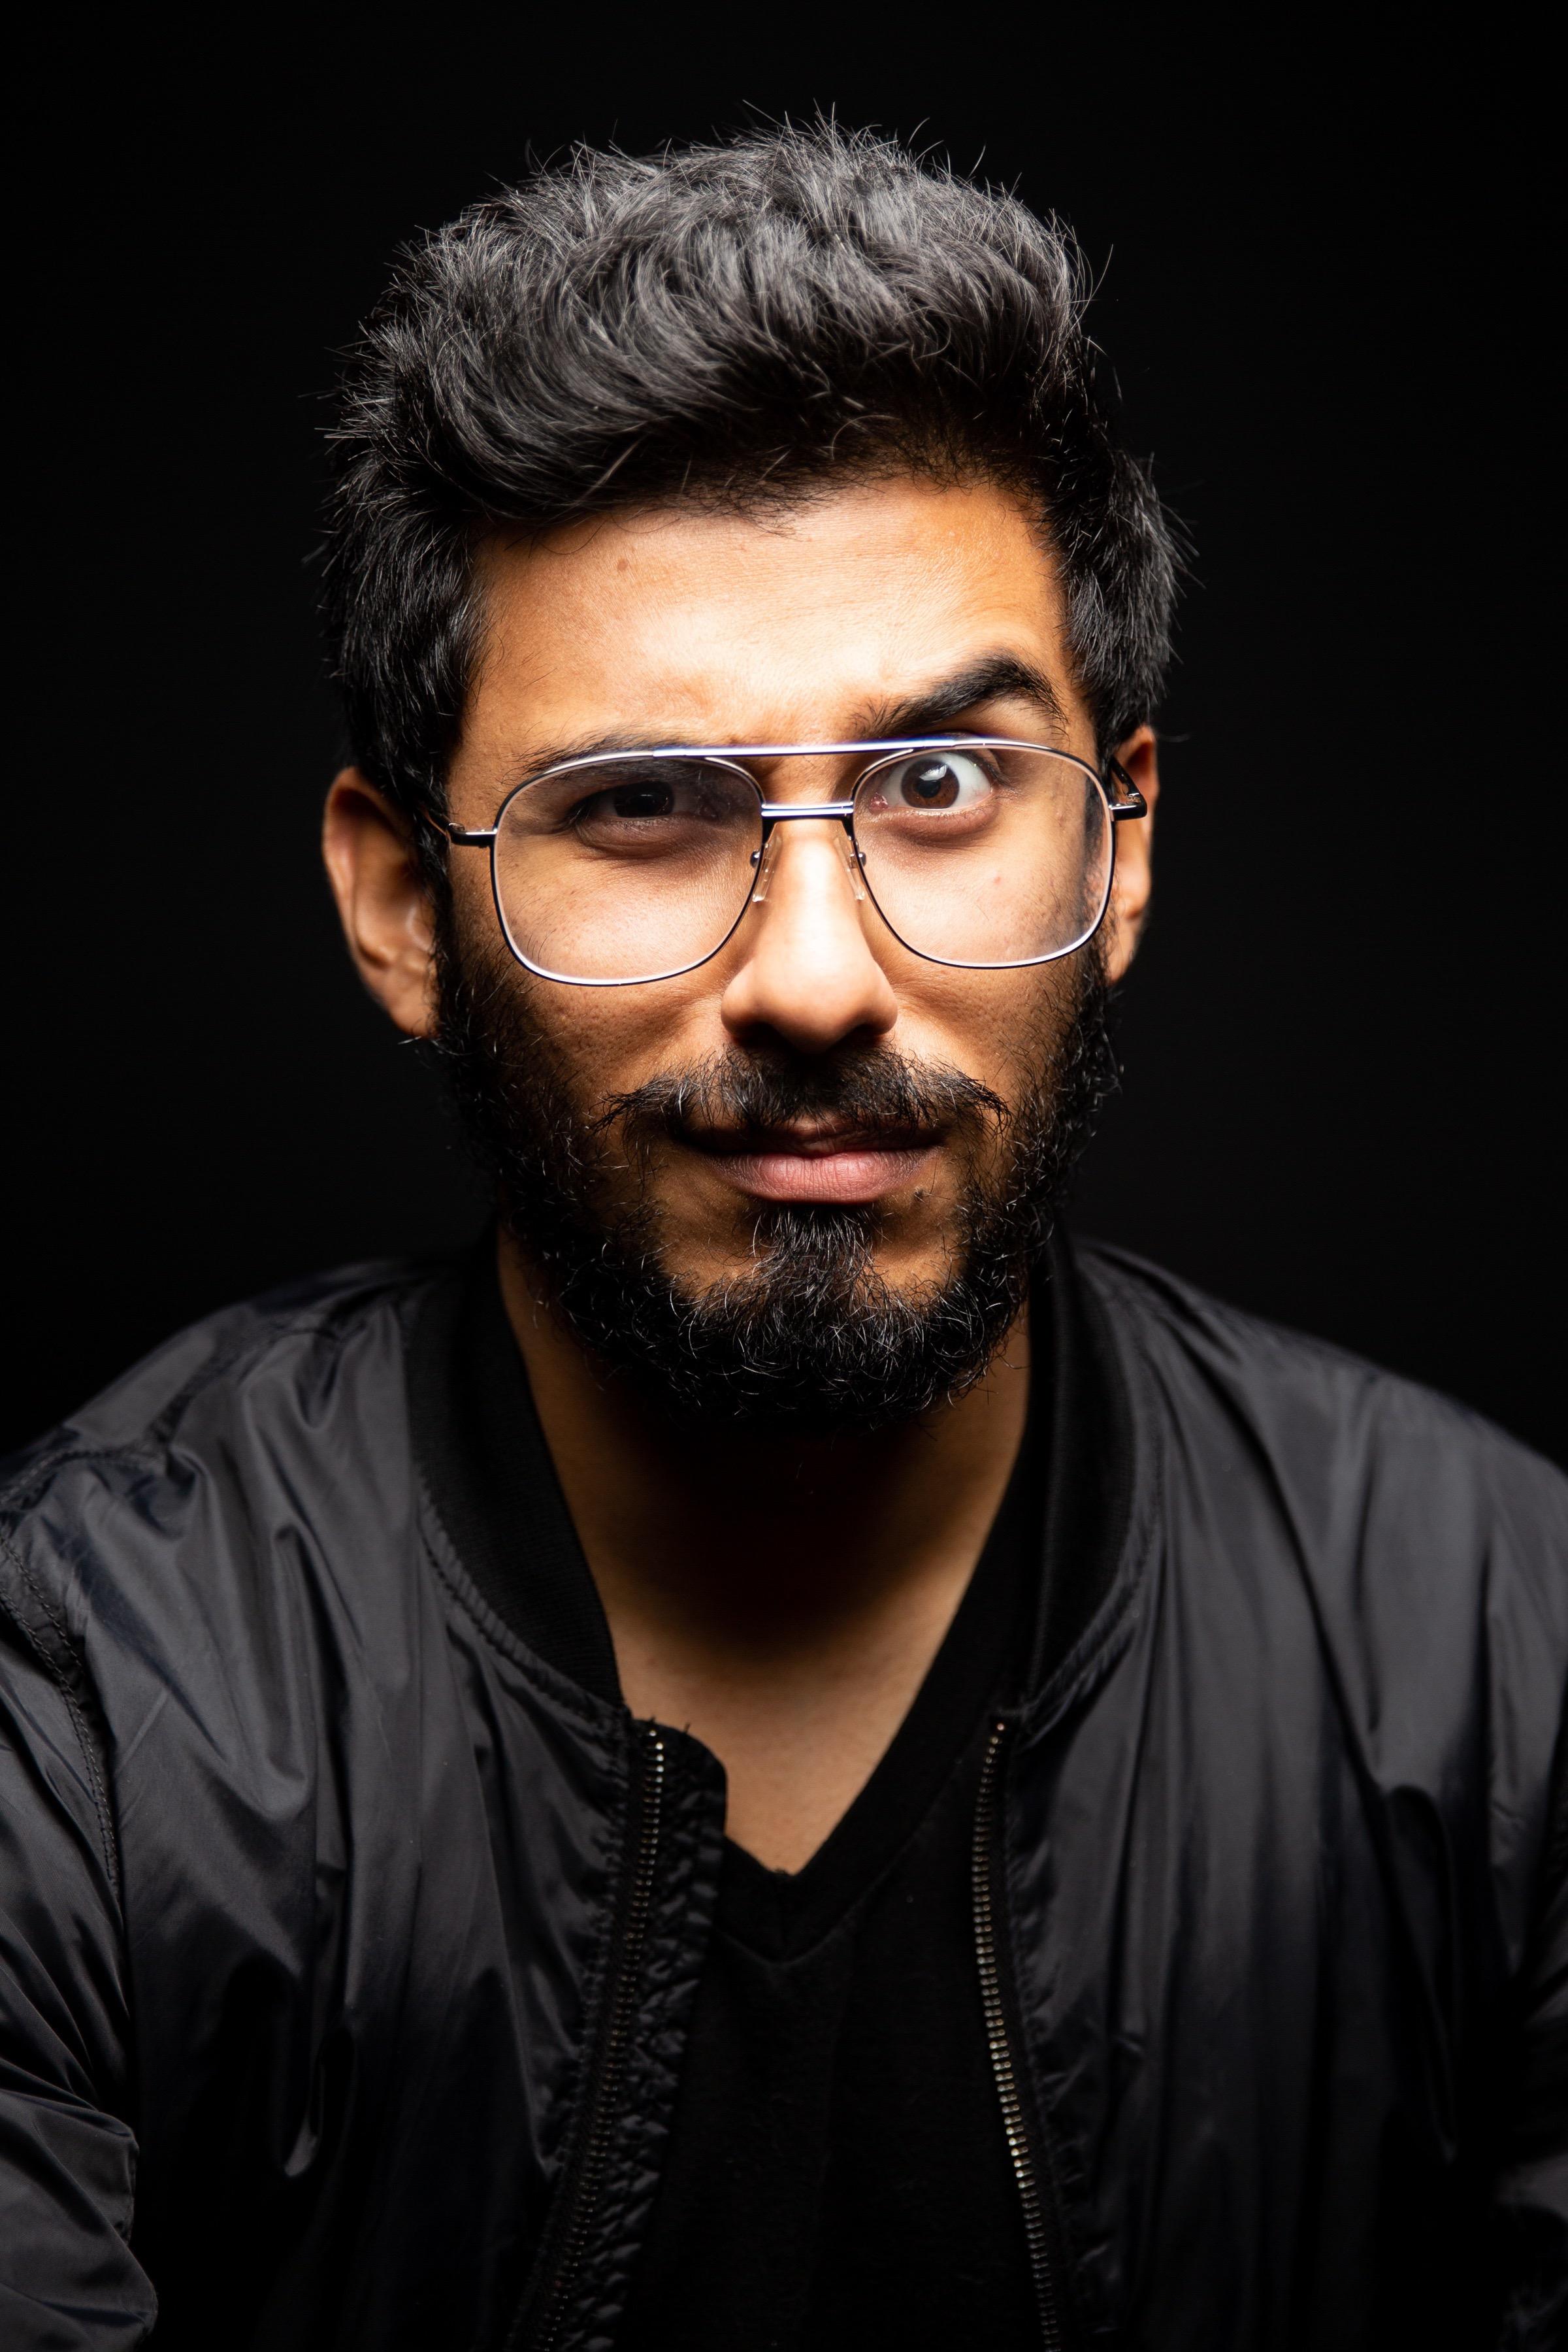 Rafeh Qazi